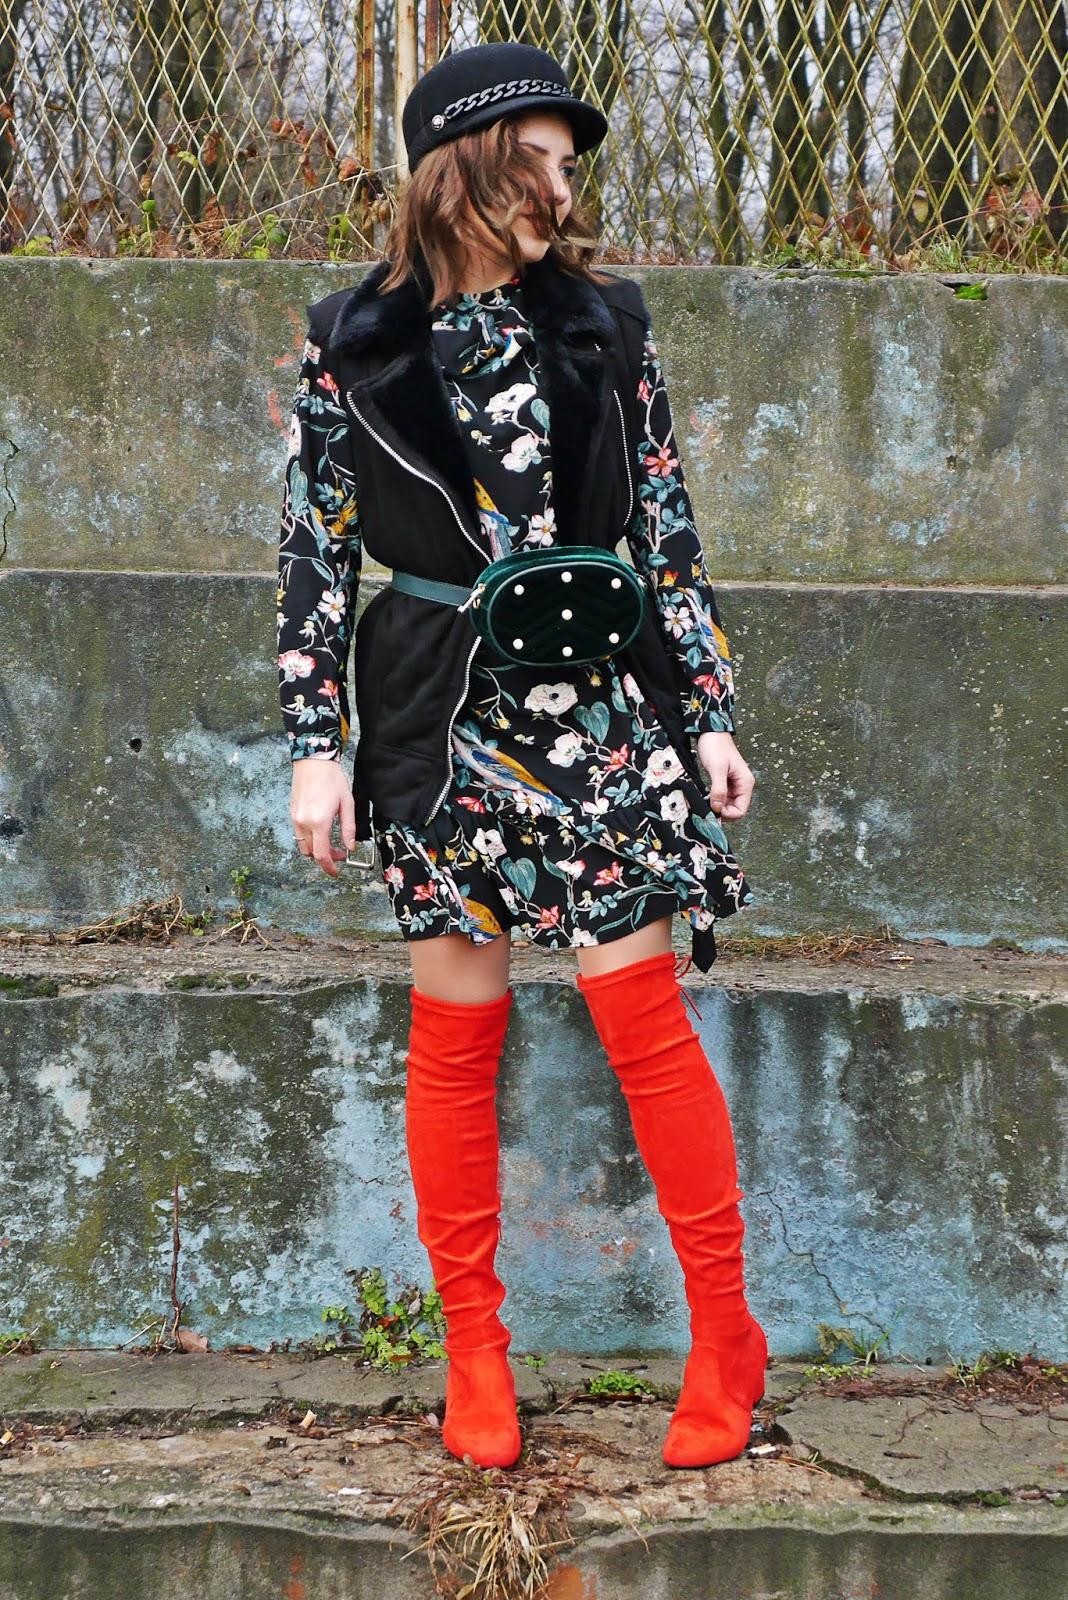 floral dress high knee red boots outfit look karyn blog modowy fashion blogger blogerka modowa modowe stylizacje ciekawe